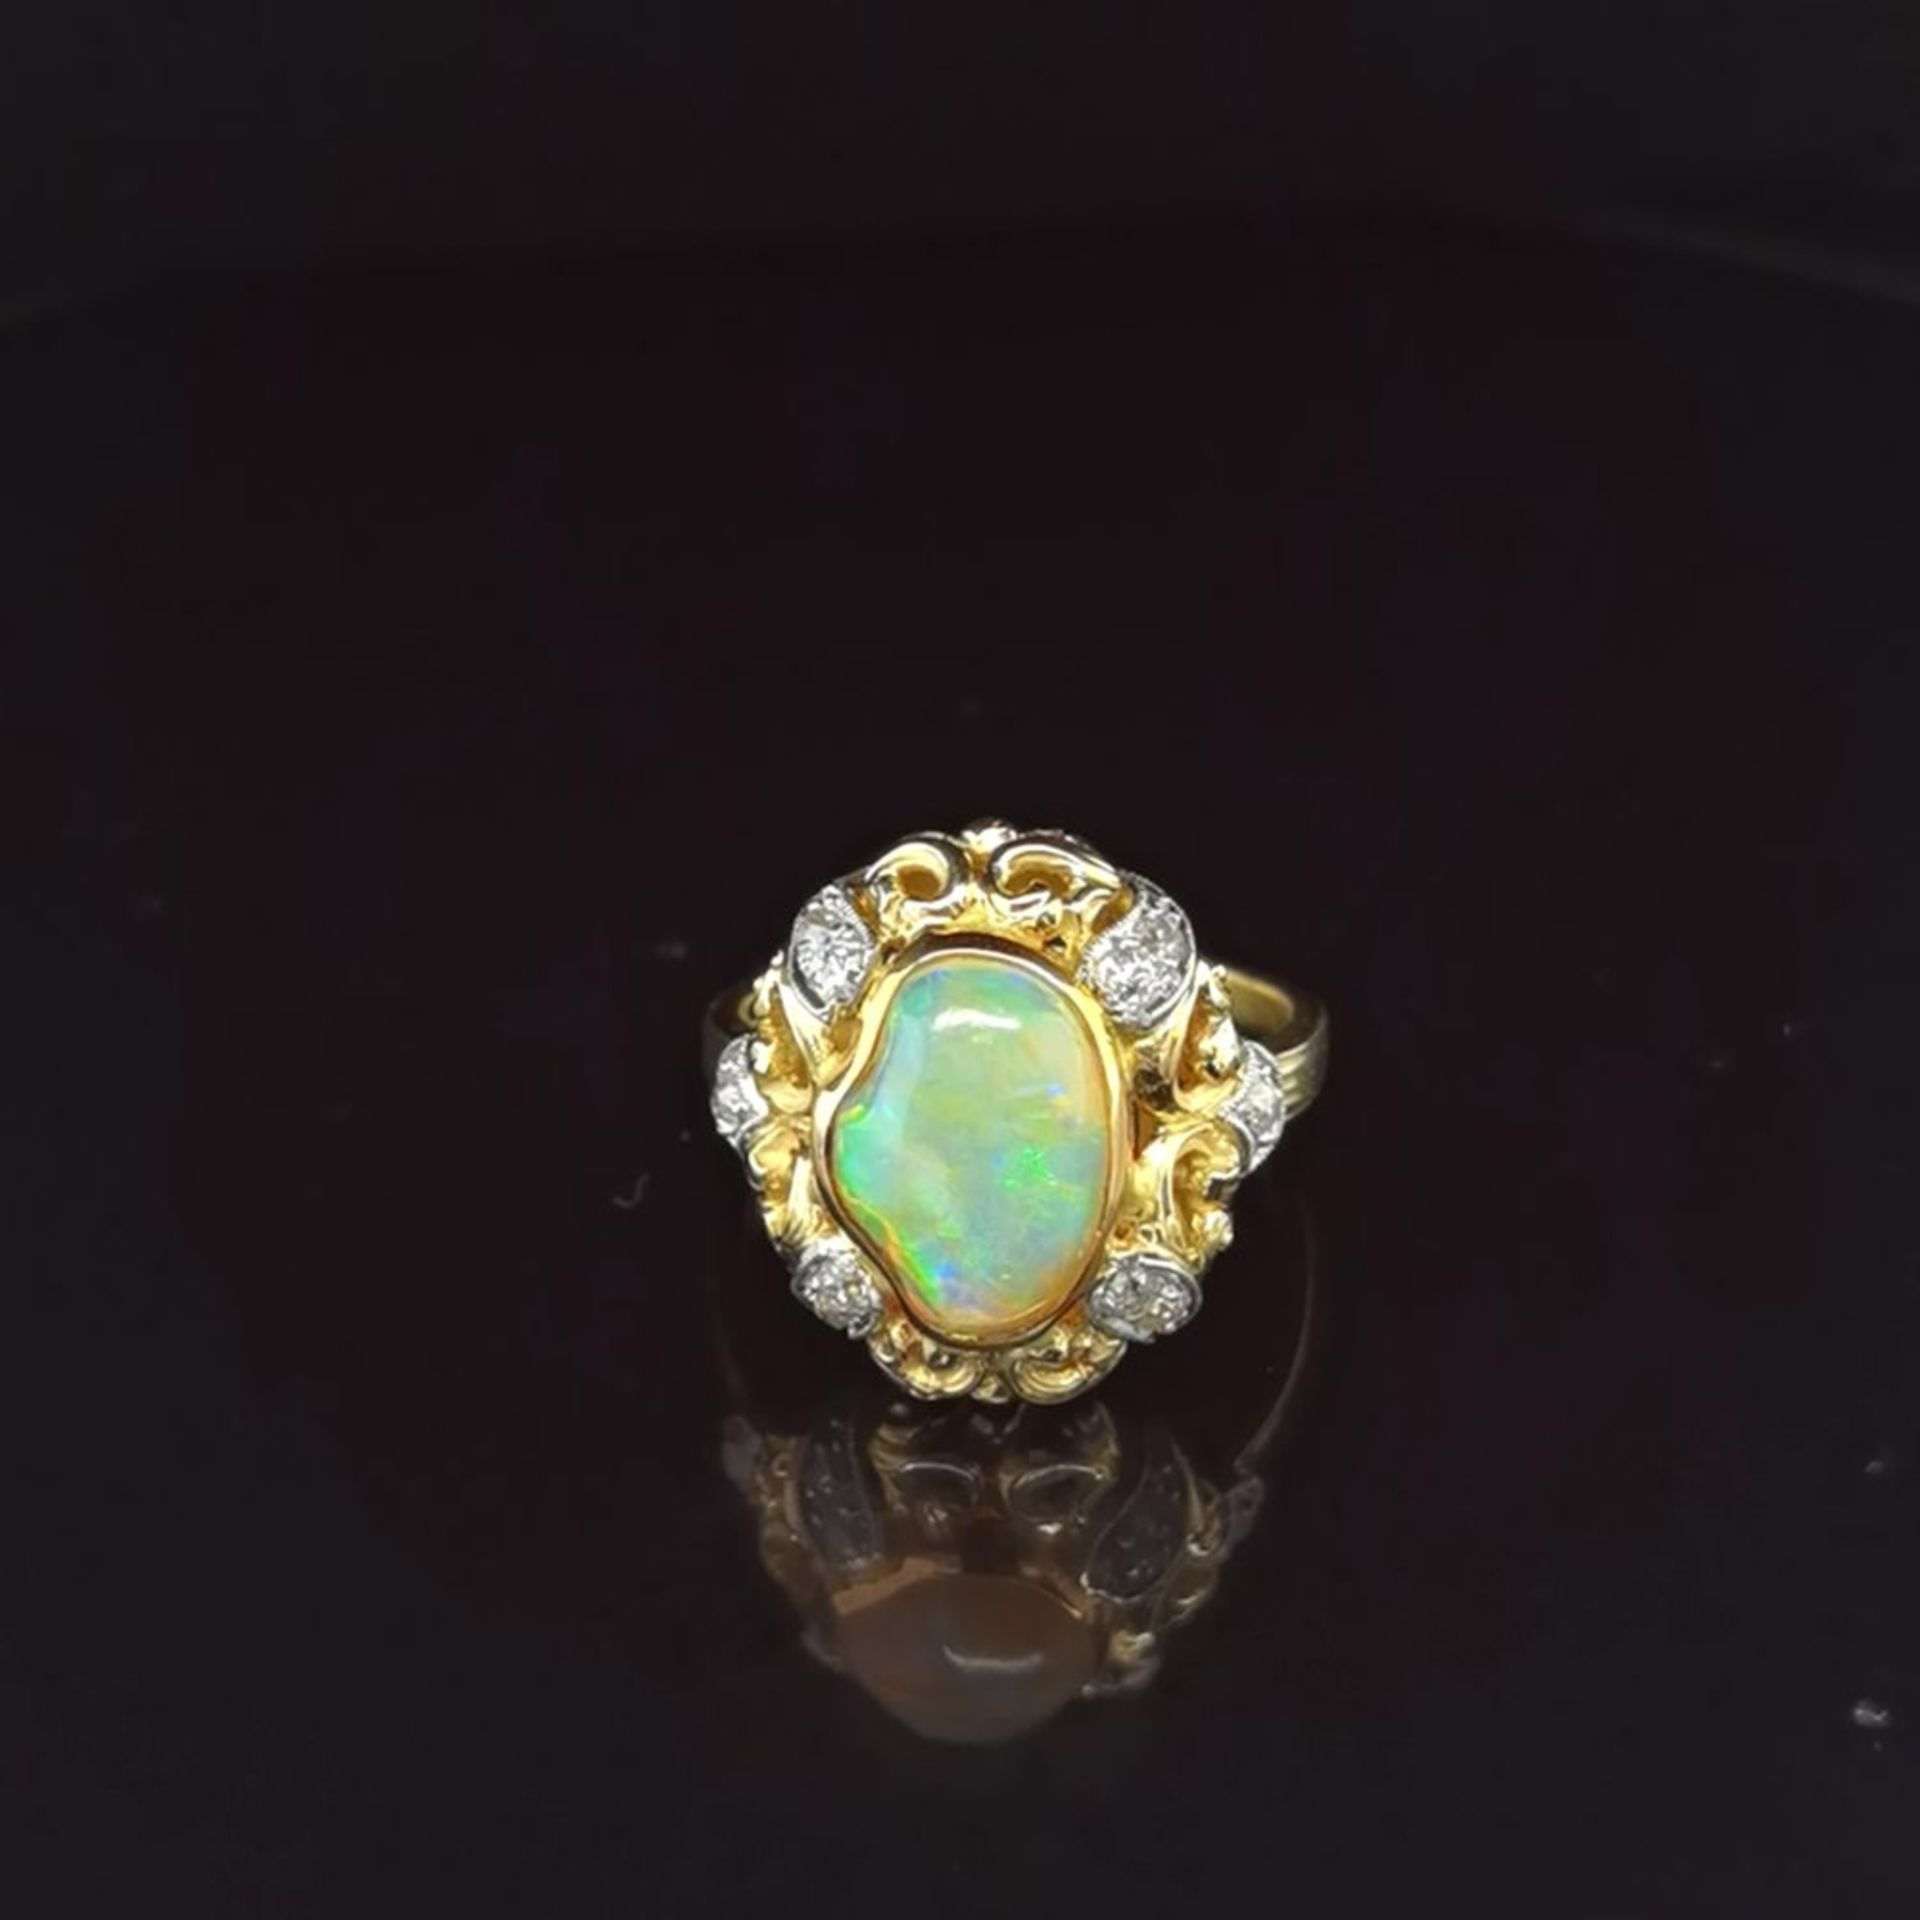 Opal-Brillant-Ring, 750 Gelbgold 7,5